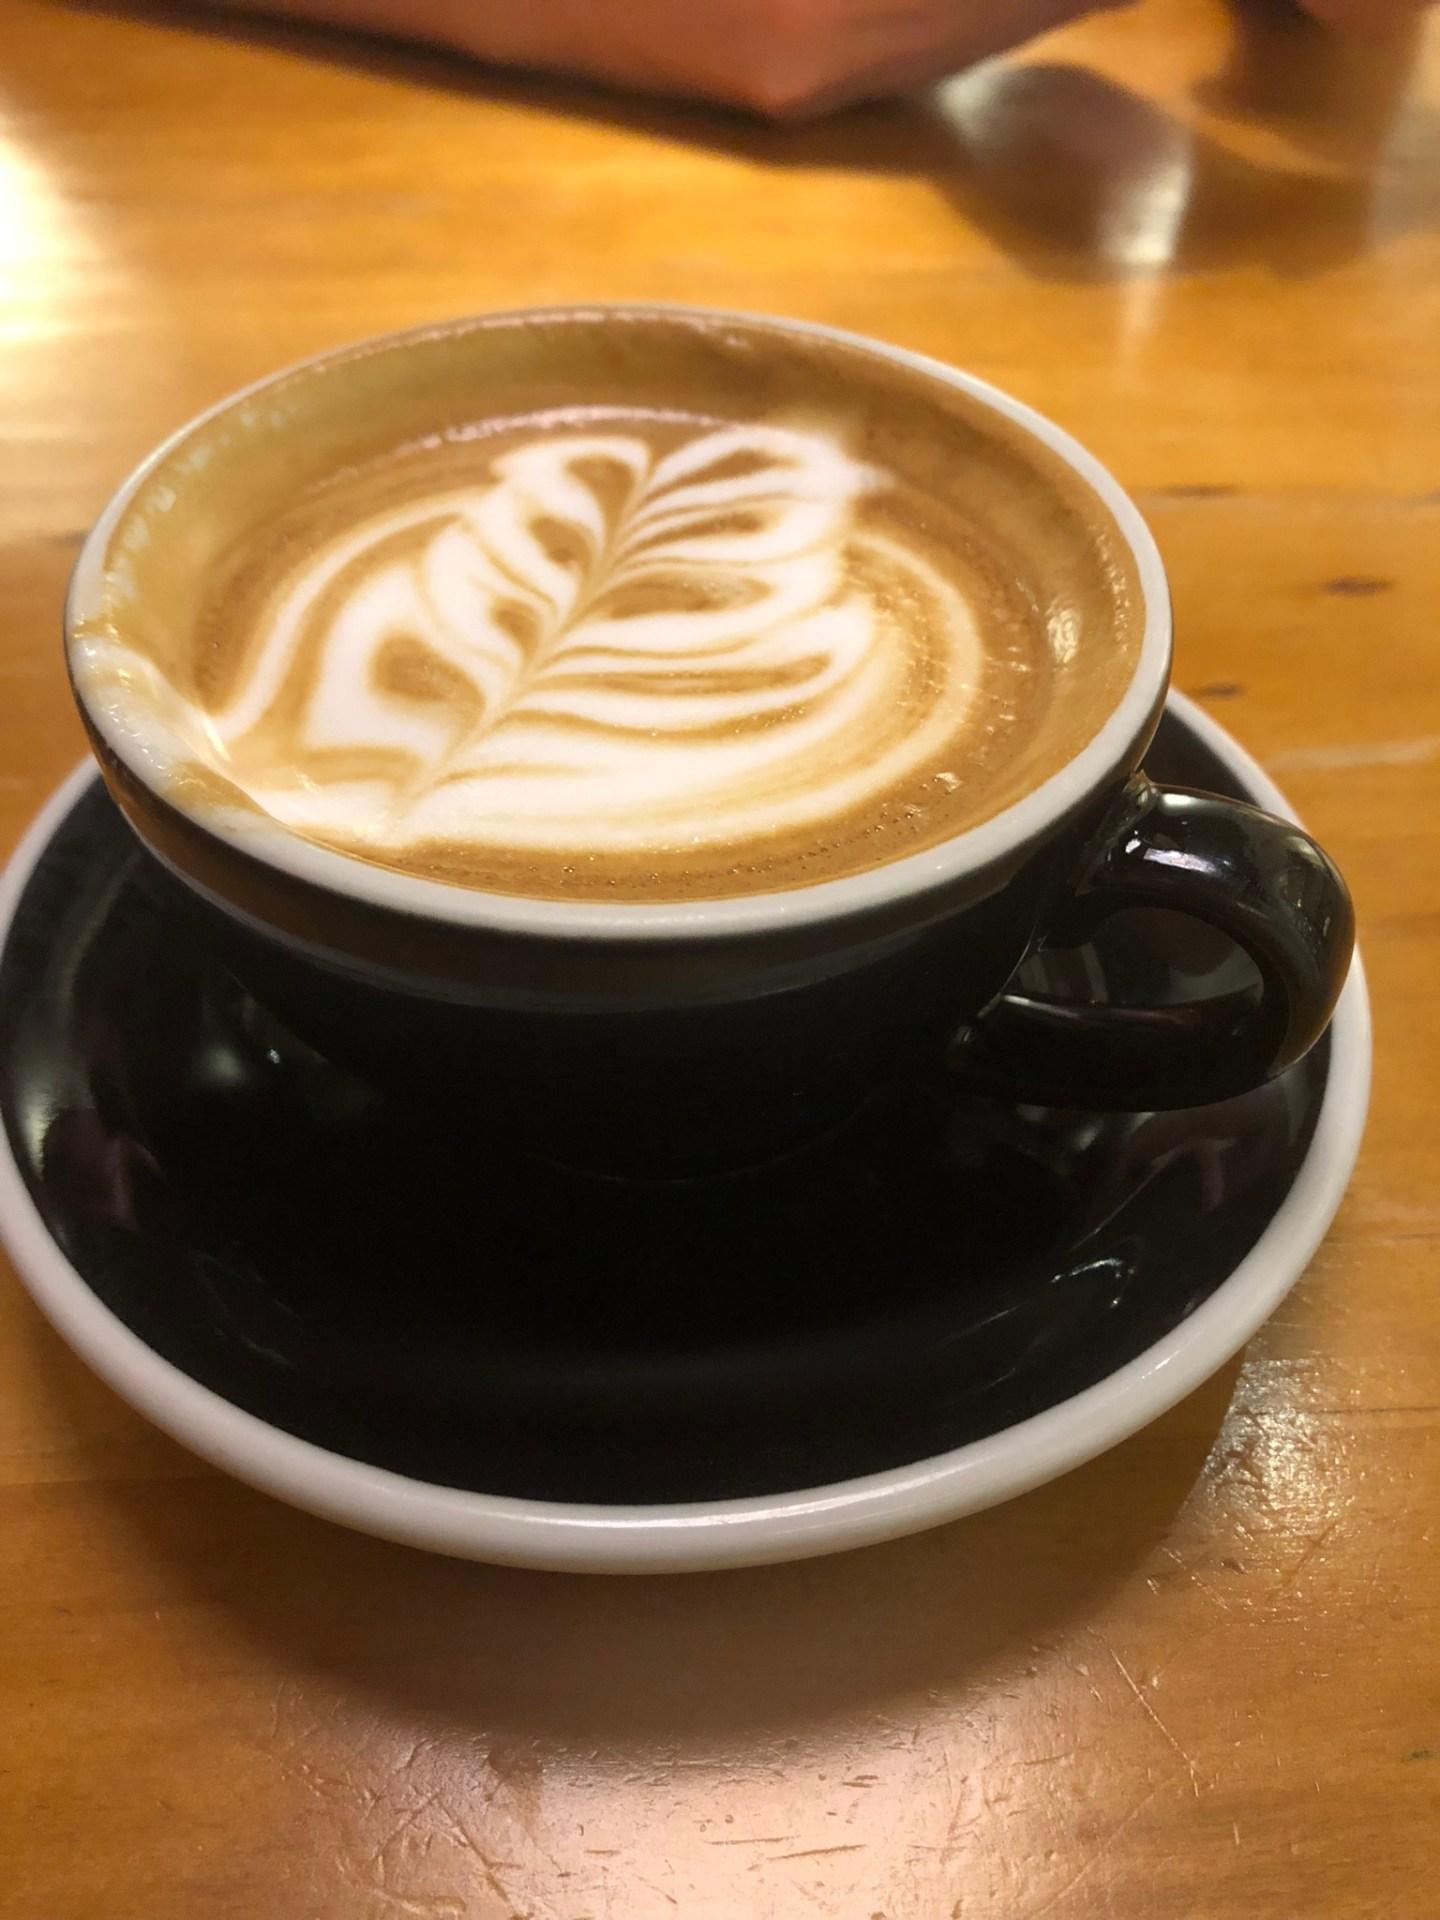 Latte from Black Sugar Coffee, Kowloon